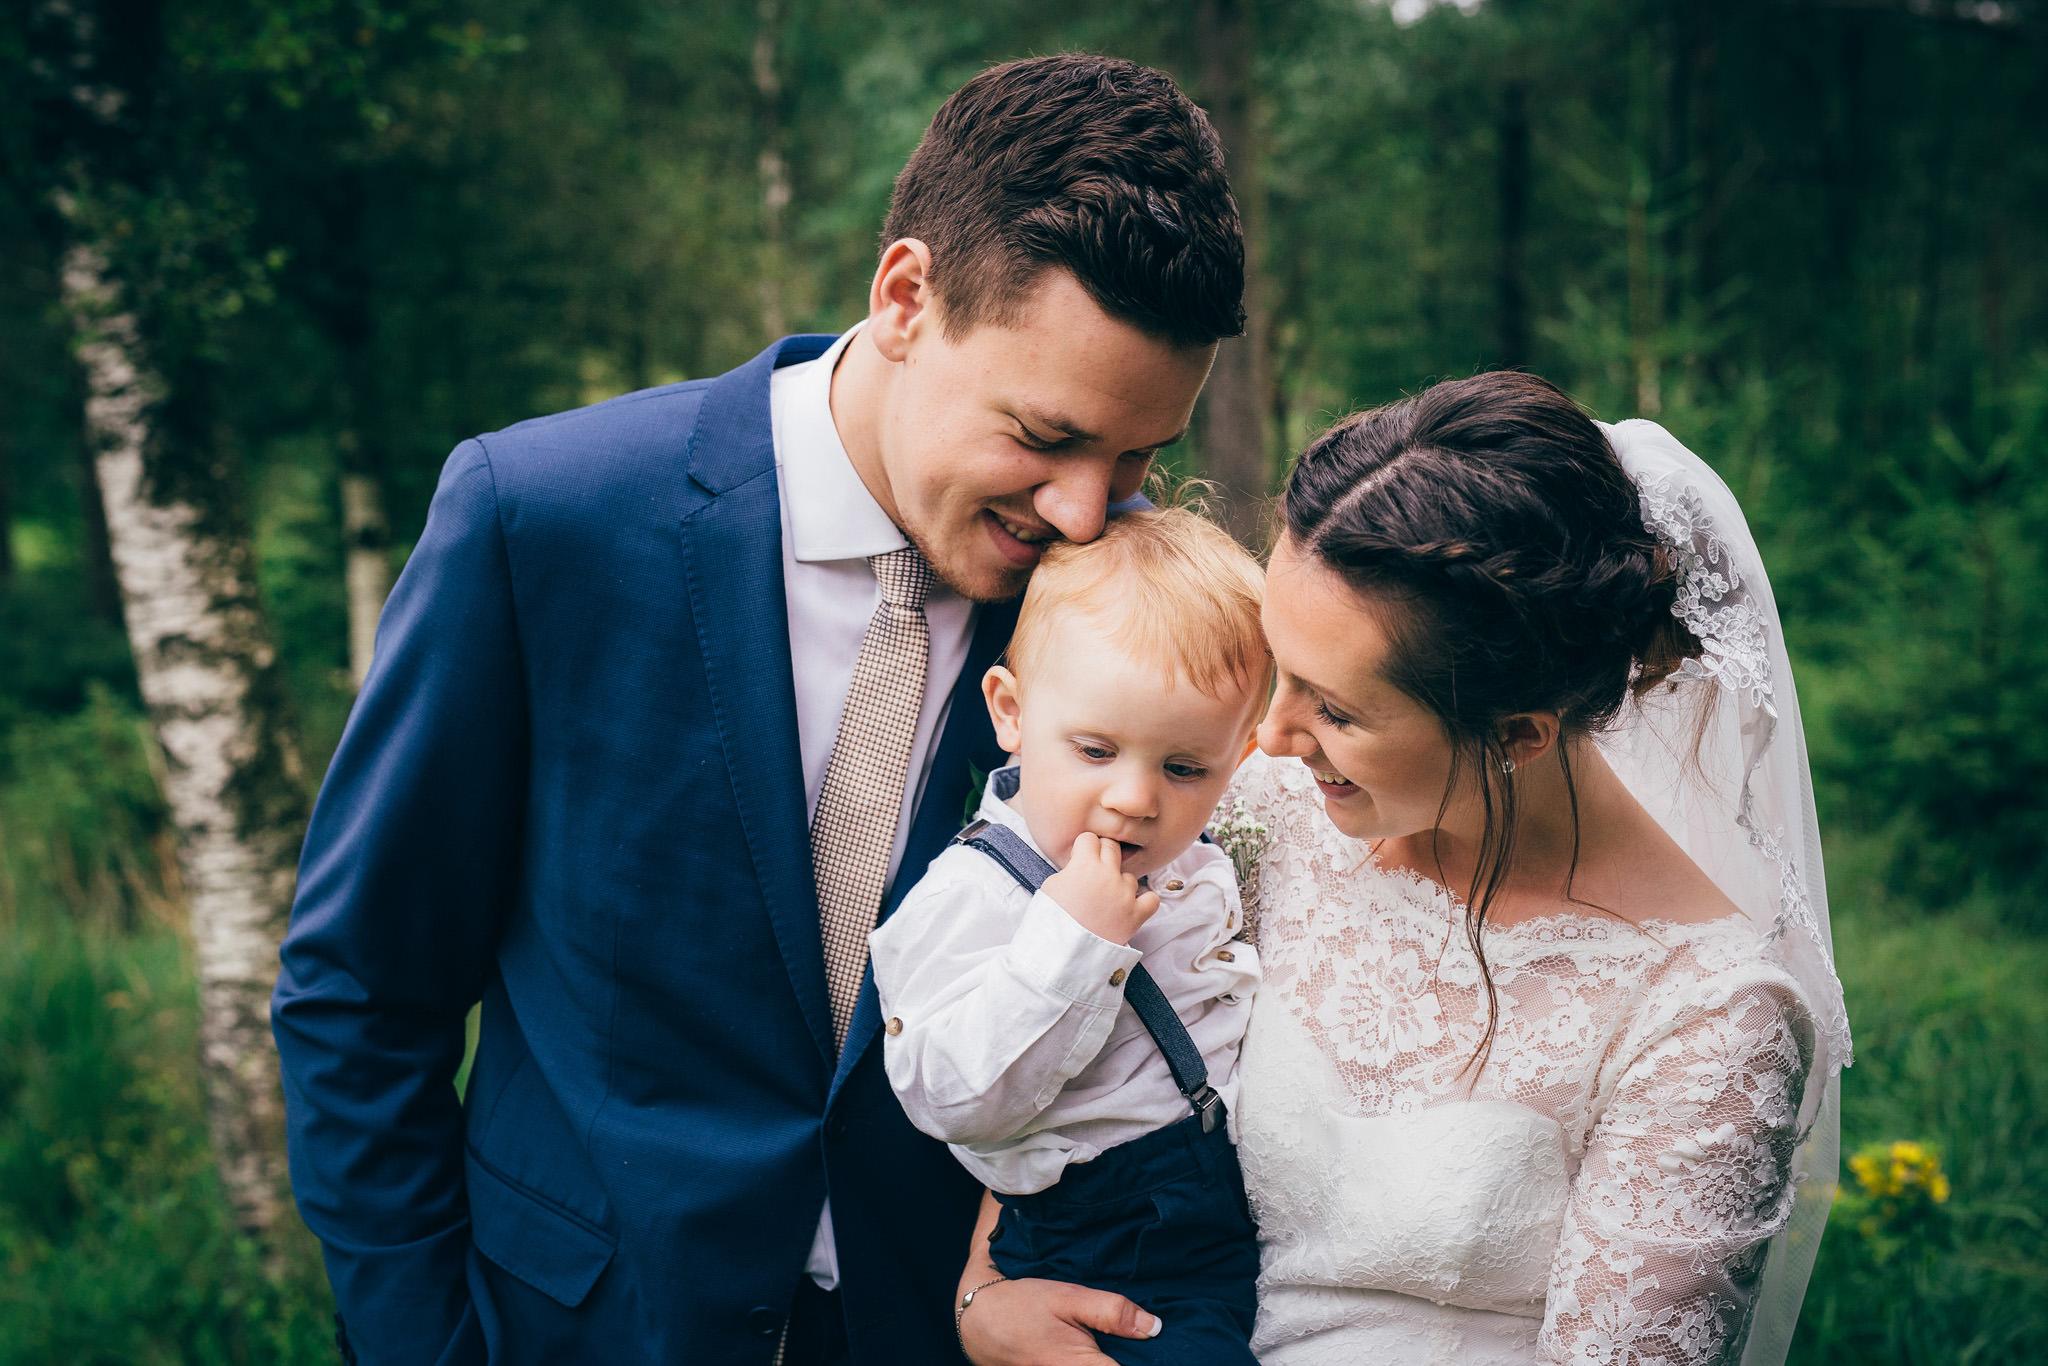 Norway+wedding+photographer+elopement+pre+wedding+Casey+Arneson-53.jpg